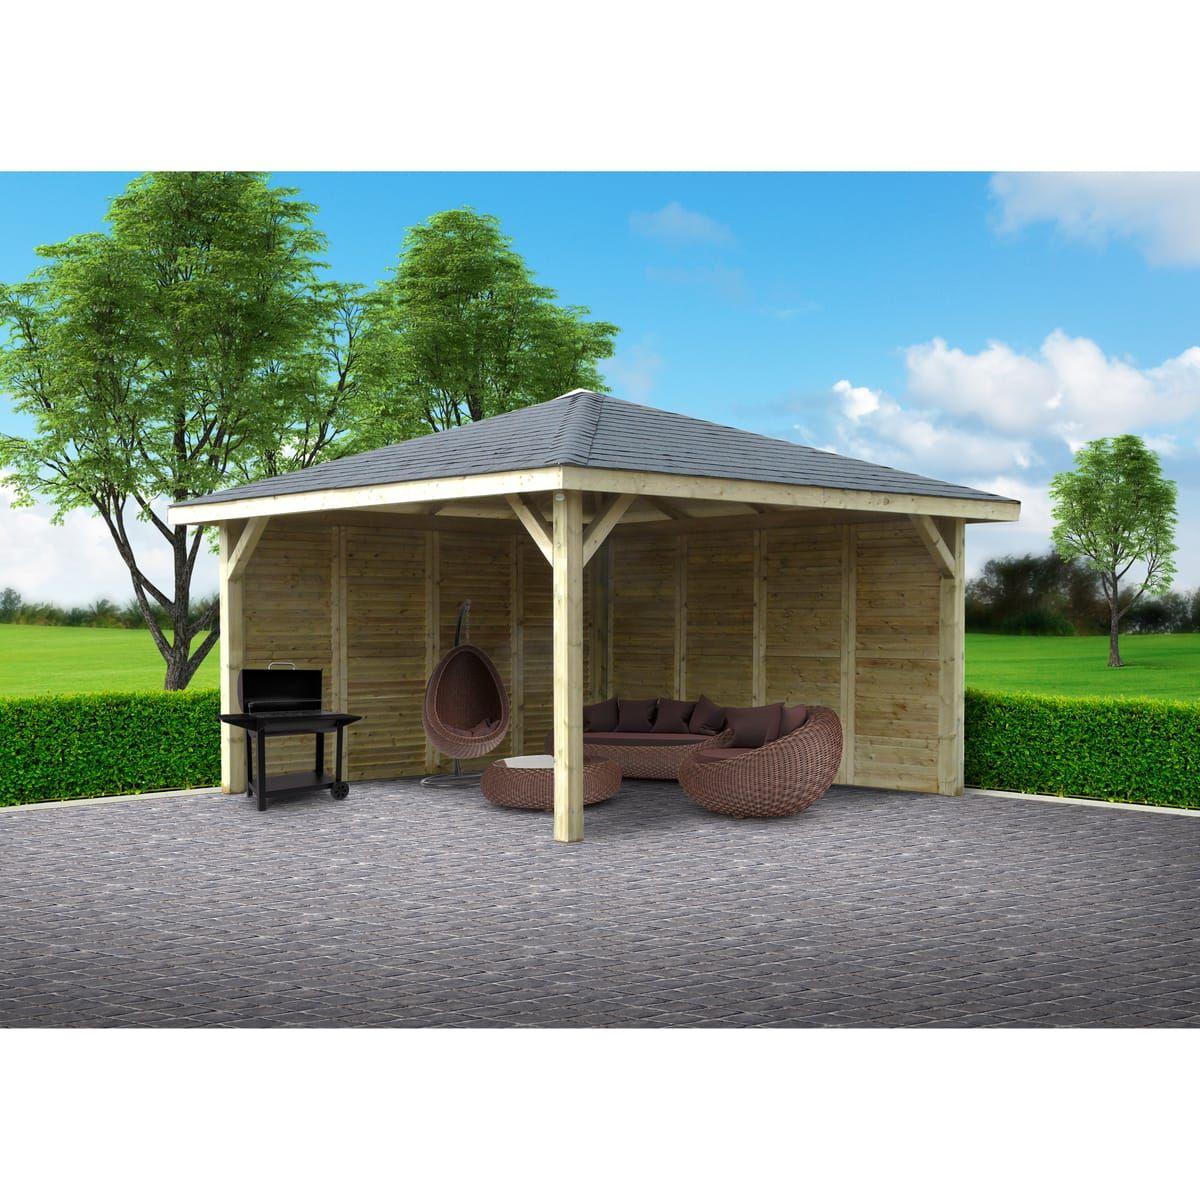 Epingle Par Barbara Prevost Sur Jardin En 2020 Kiosque Kiosque Jardin Toiture En Bois